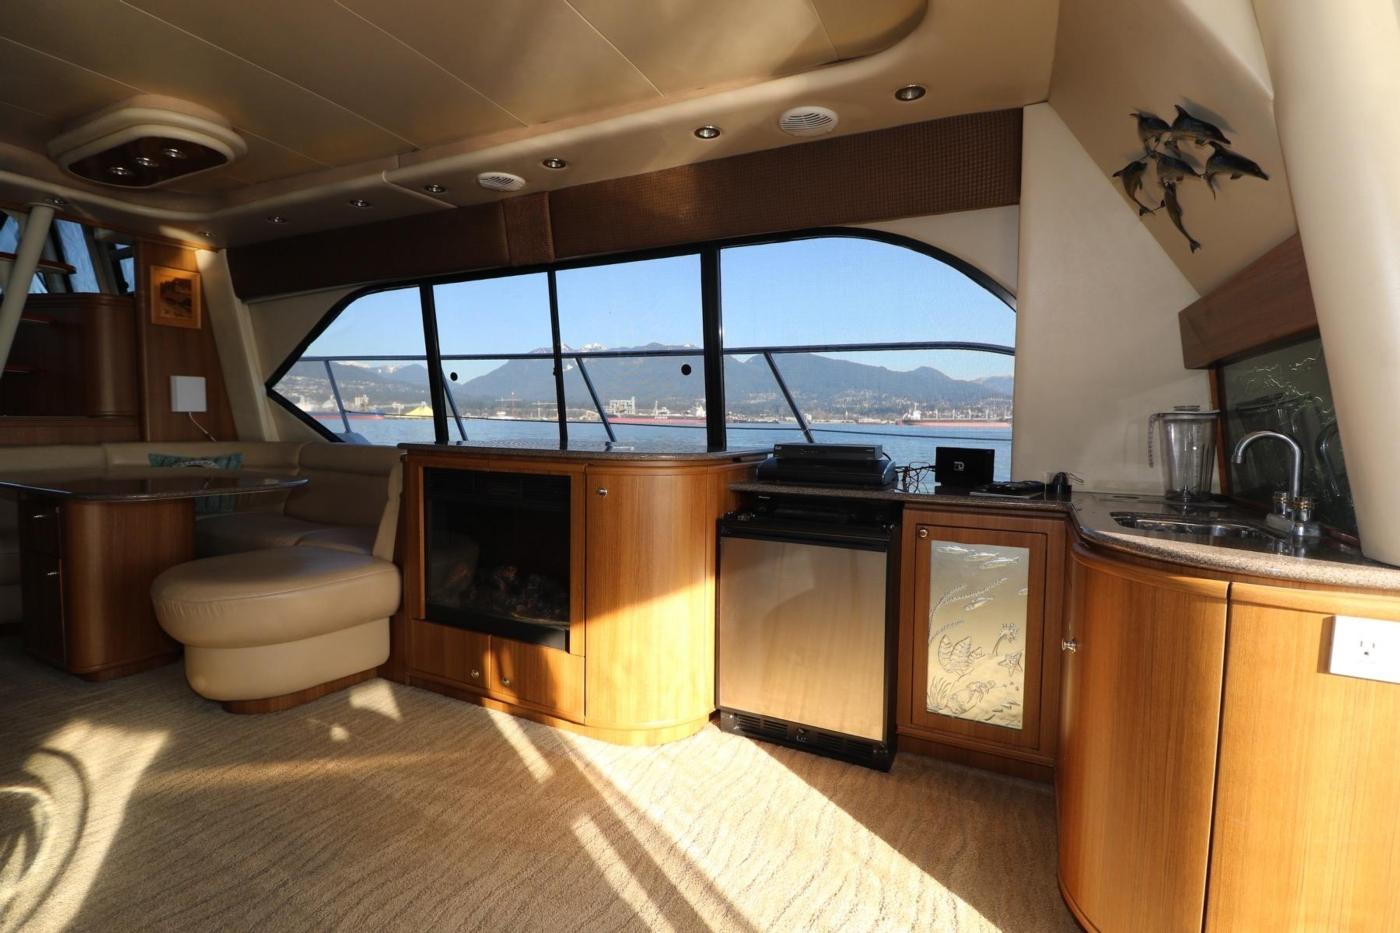 1999 Bayliner 5788 Pilot House Motoryacht, Entertainment Console